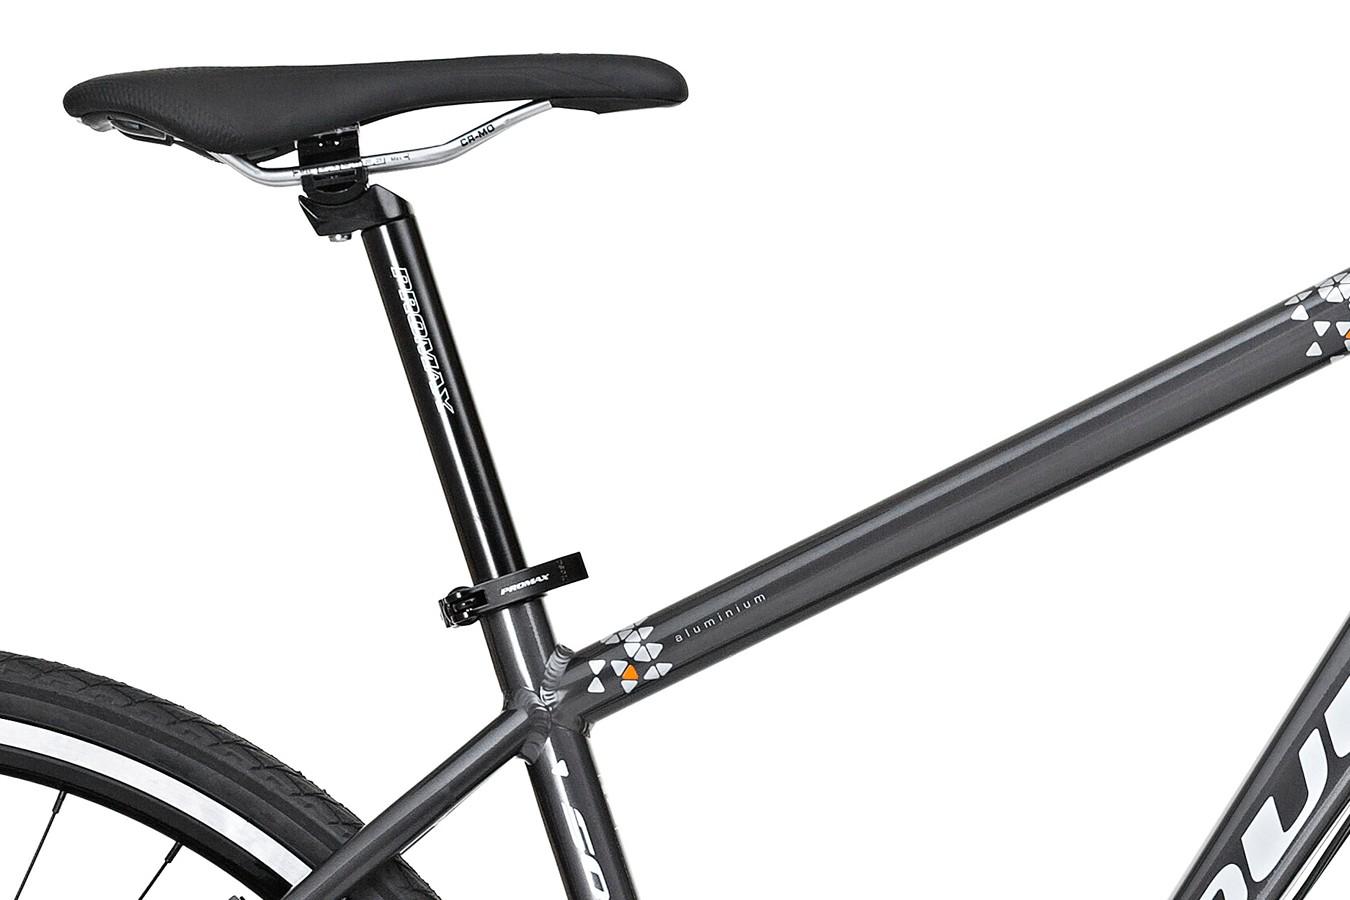 Bicicleta 700 Garopaba Urbana - Soul Cycles